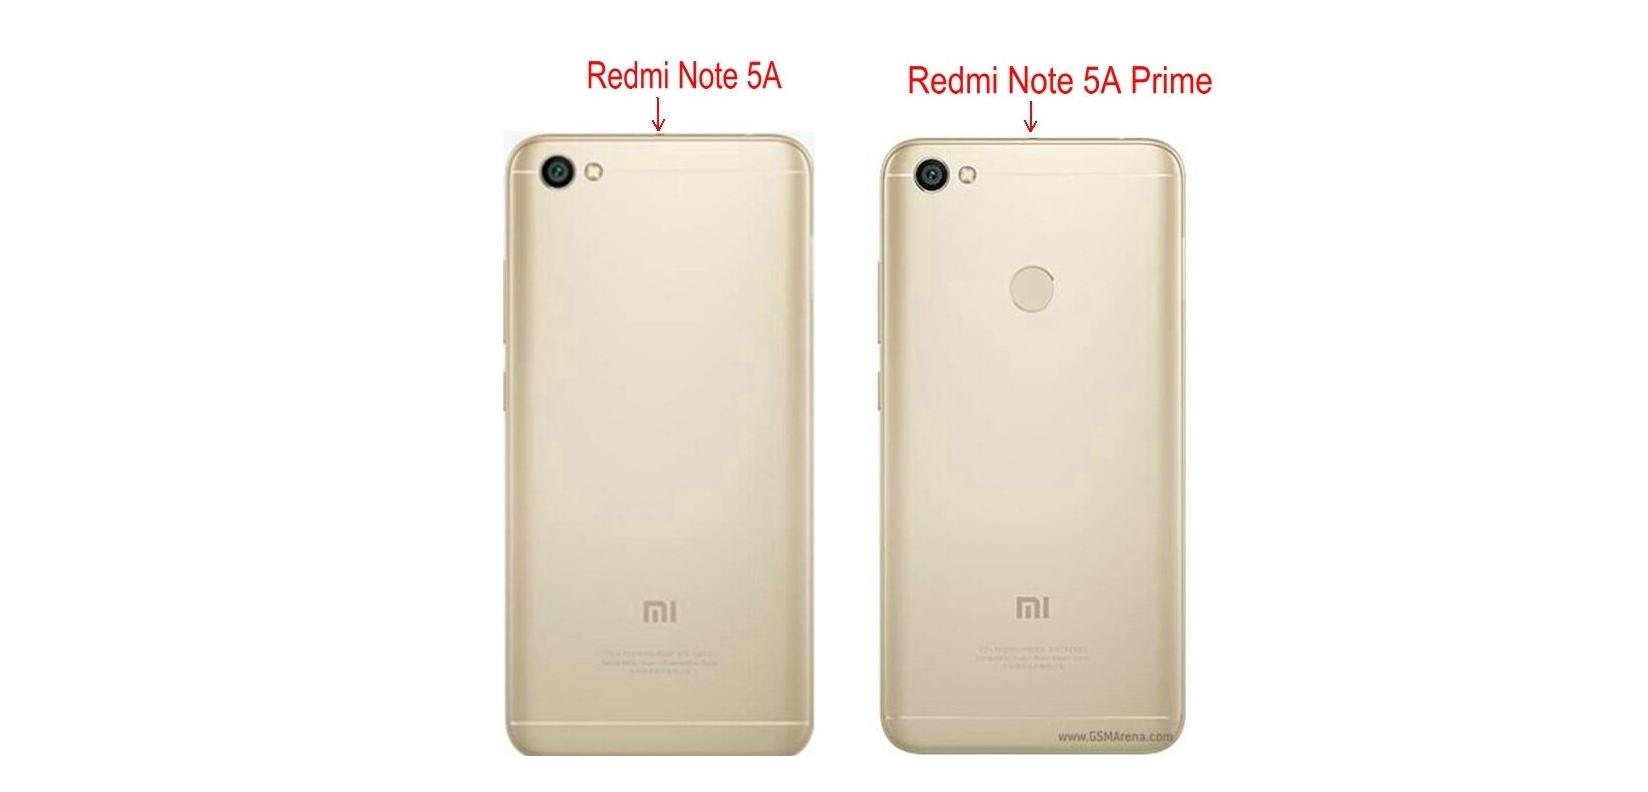 Note 5 - Prime